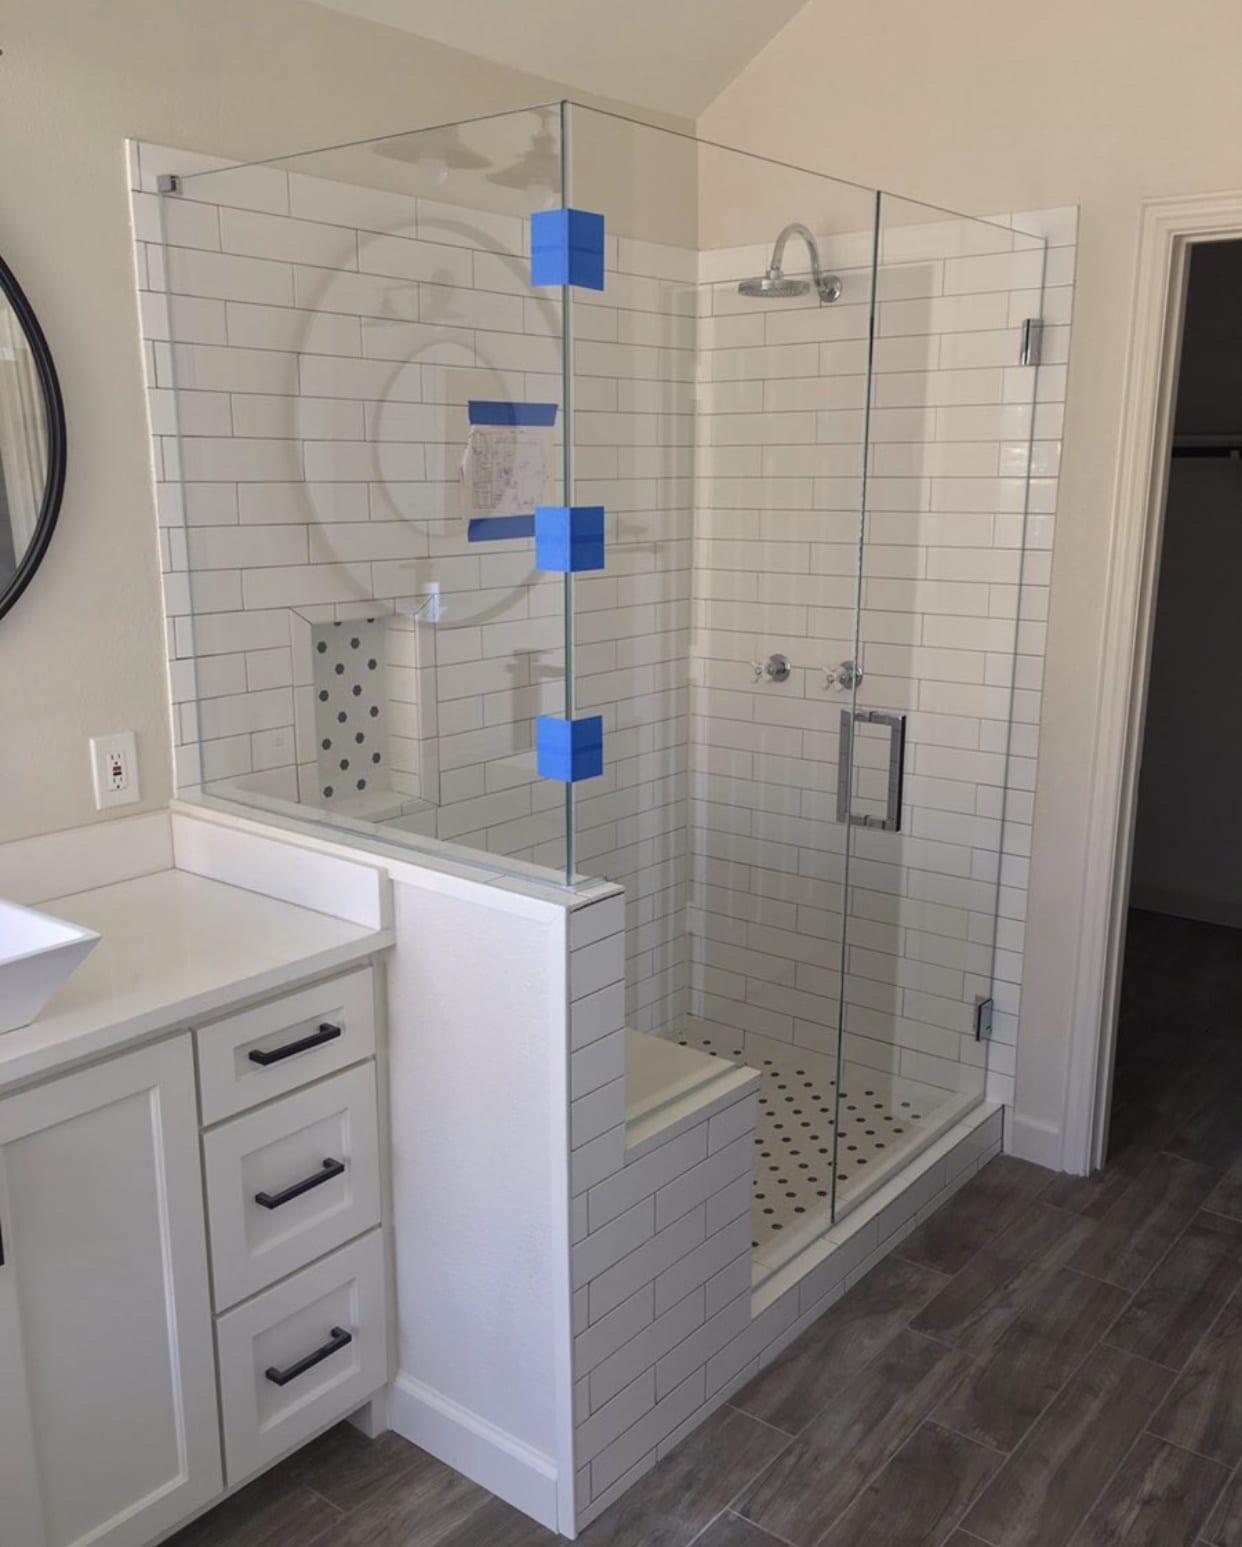 frameless shower doors img 2171 custom bathroom mirrors and decorative glass from Shower Doors of Nashville